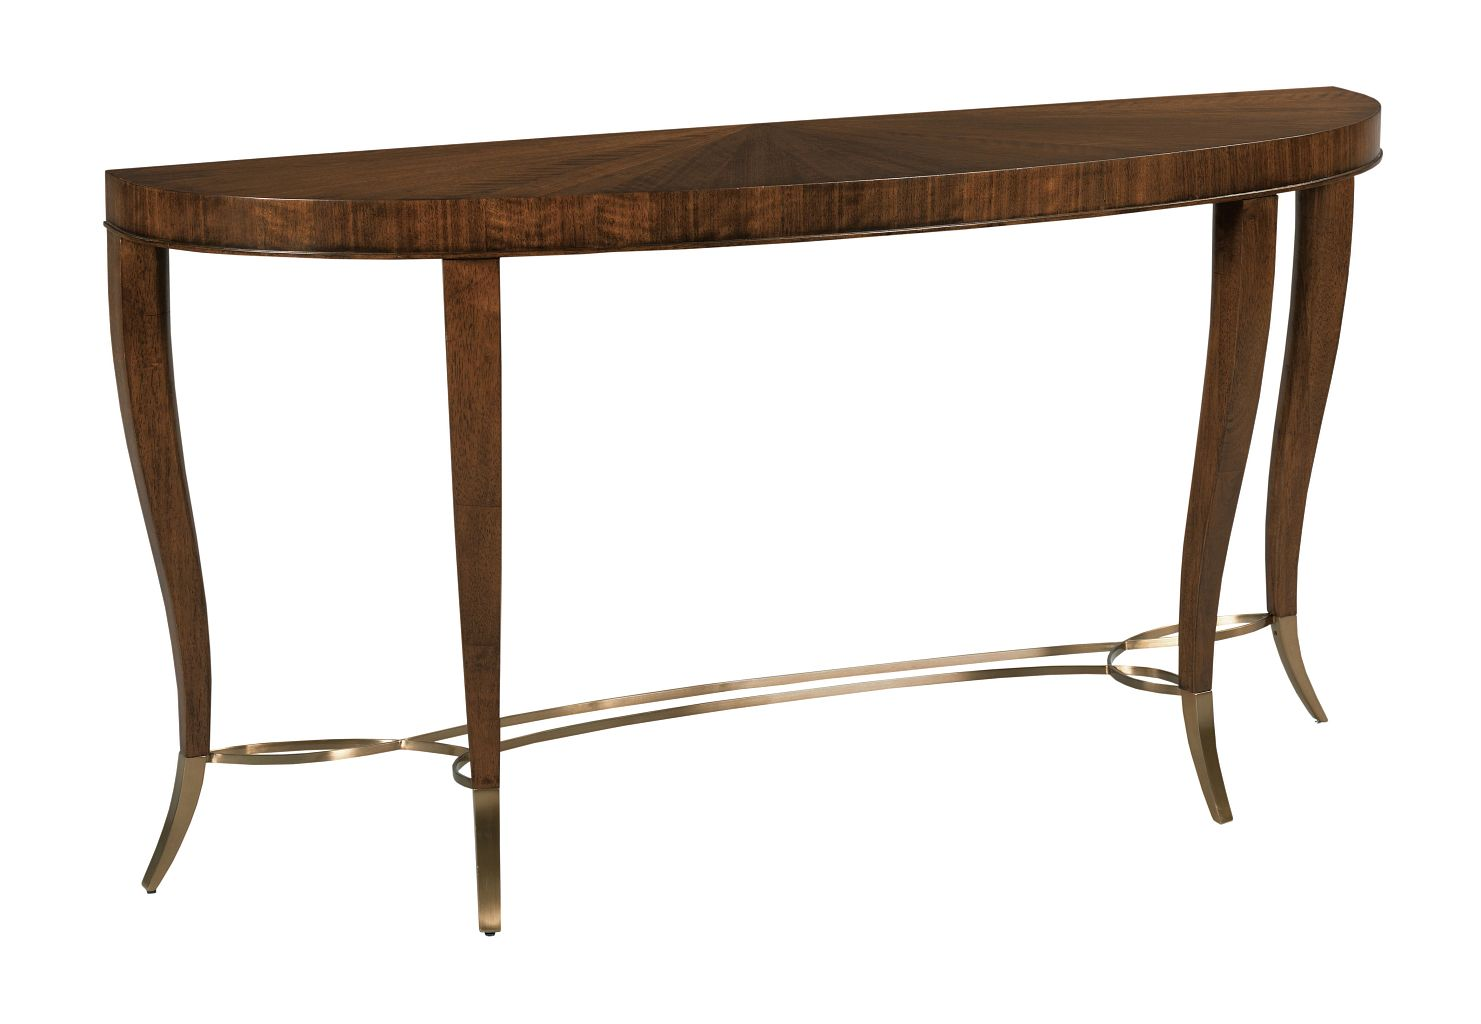 VANTAGE CONSOLE TABLE